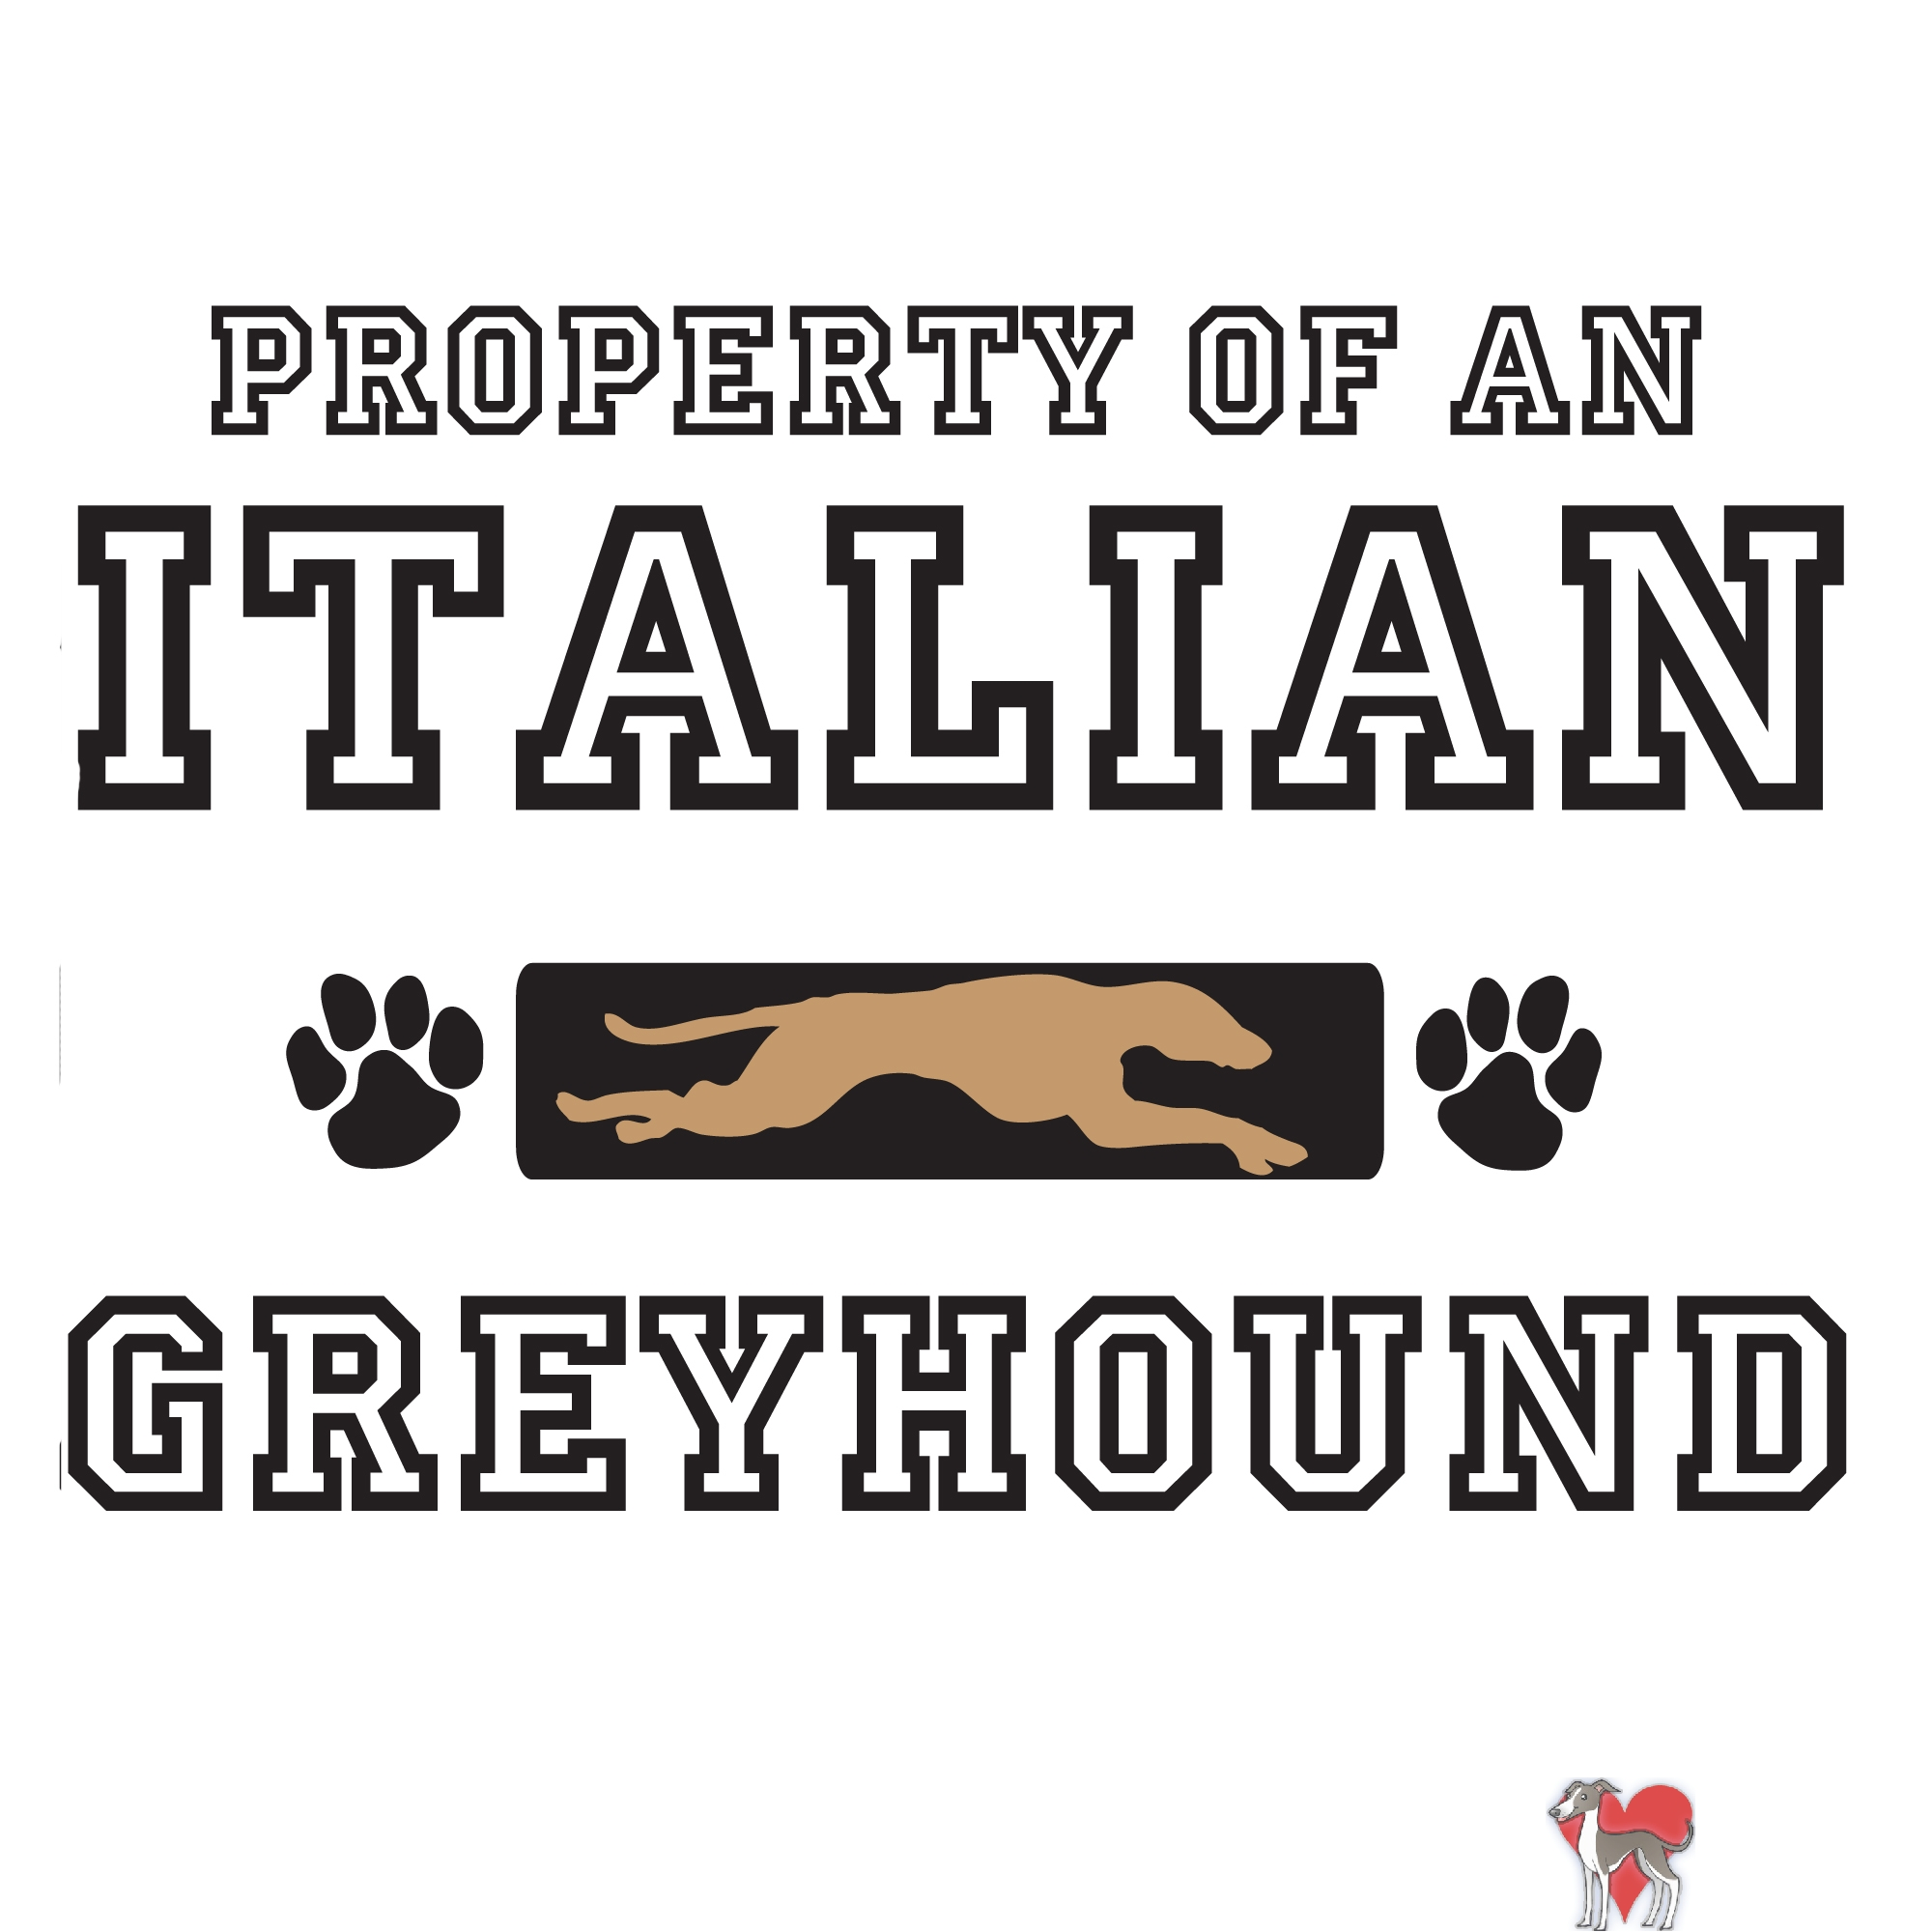 property of an italian greyhound, italian greyhound, italian greyhound shirt, ig shirt, ig, iggy, iggy shirt, greyhound shirt, property, italian, greyhound, rescue, shirt